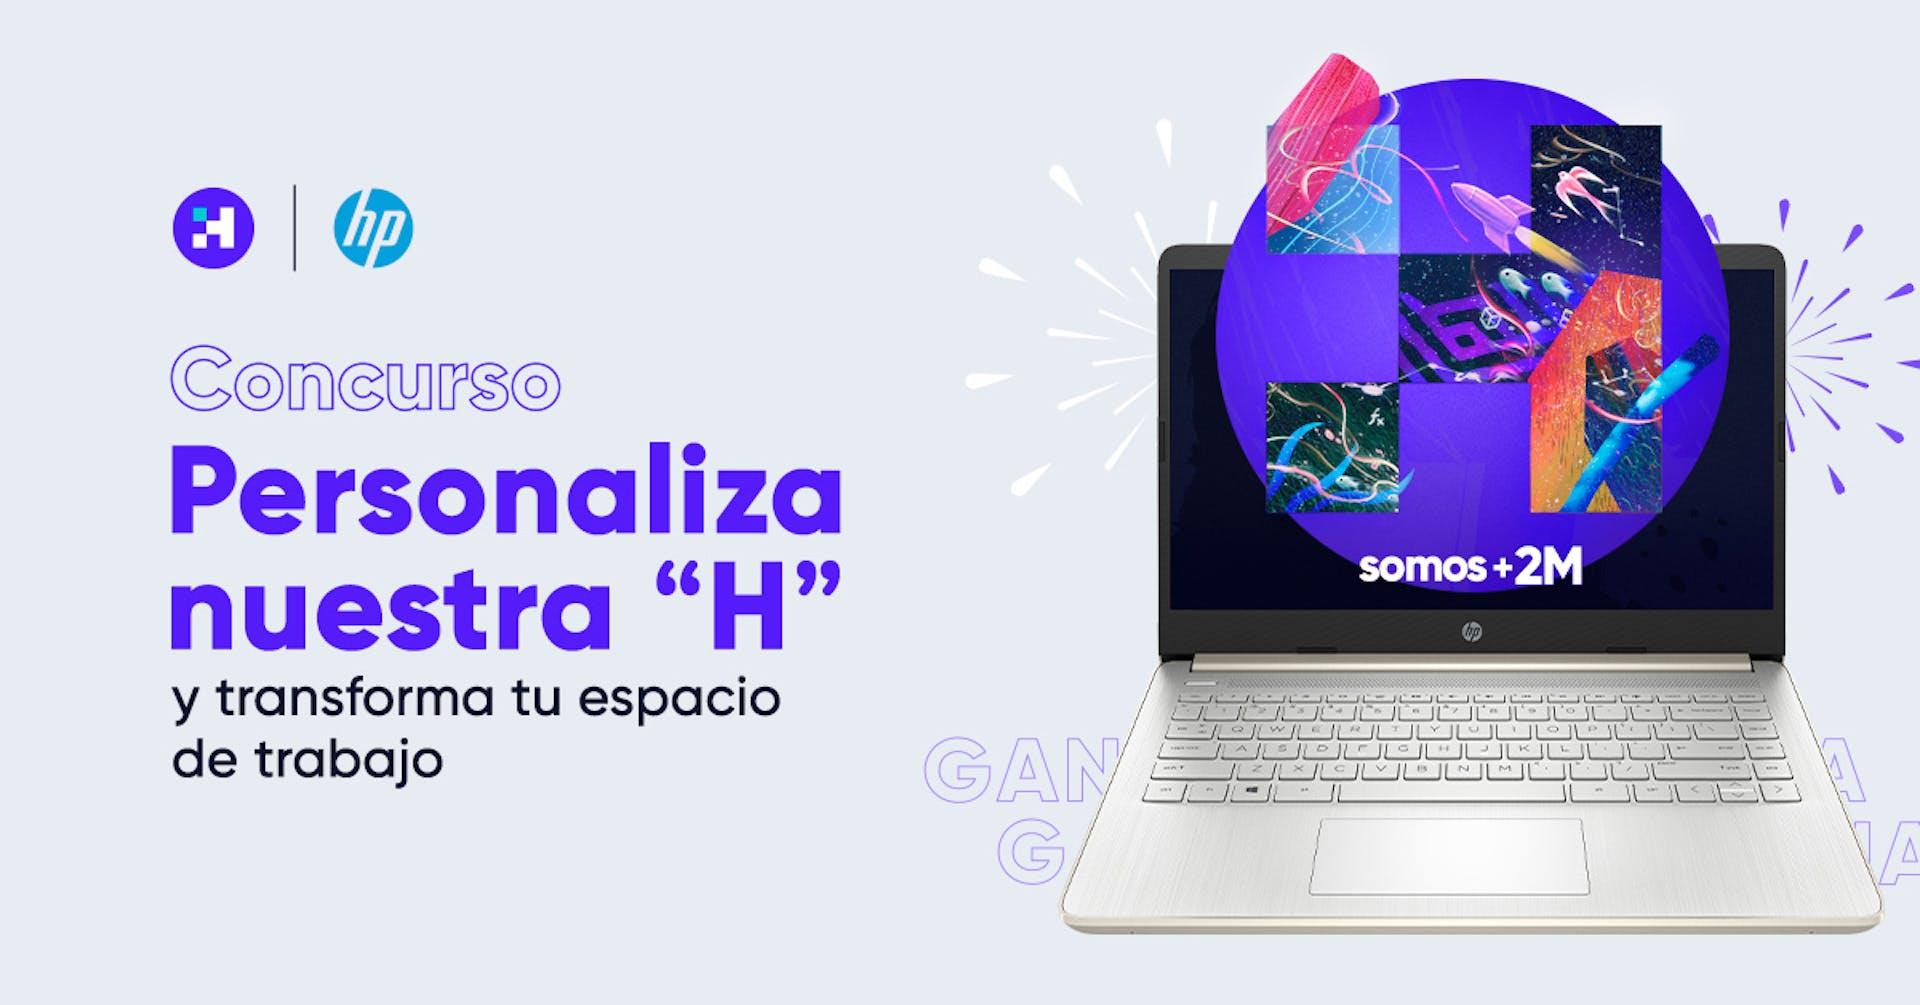 Concurso #Crehana2M: ¡Personaliza nuestra H!